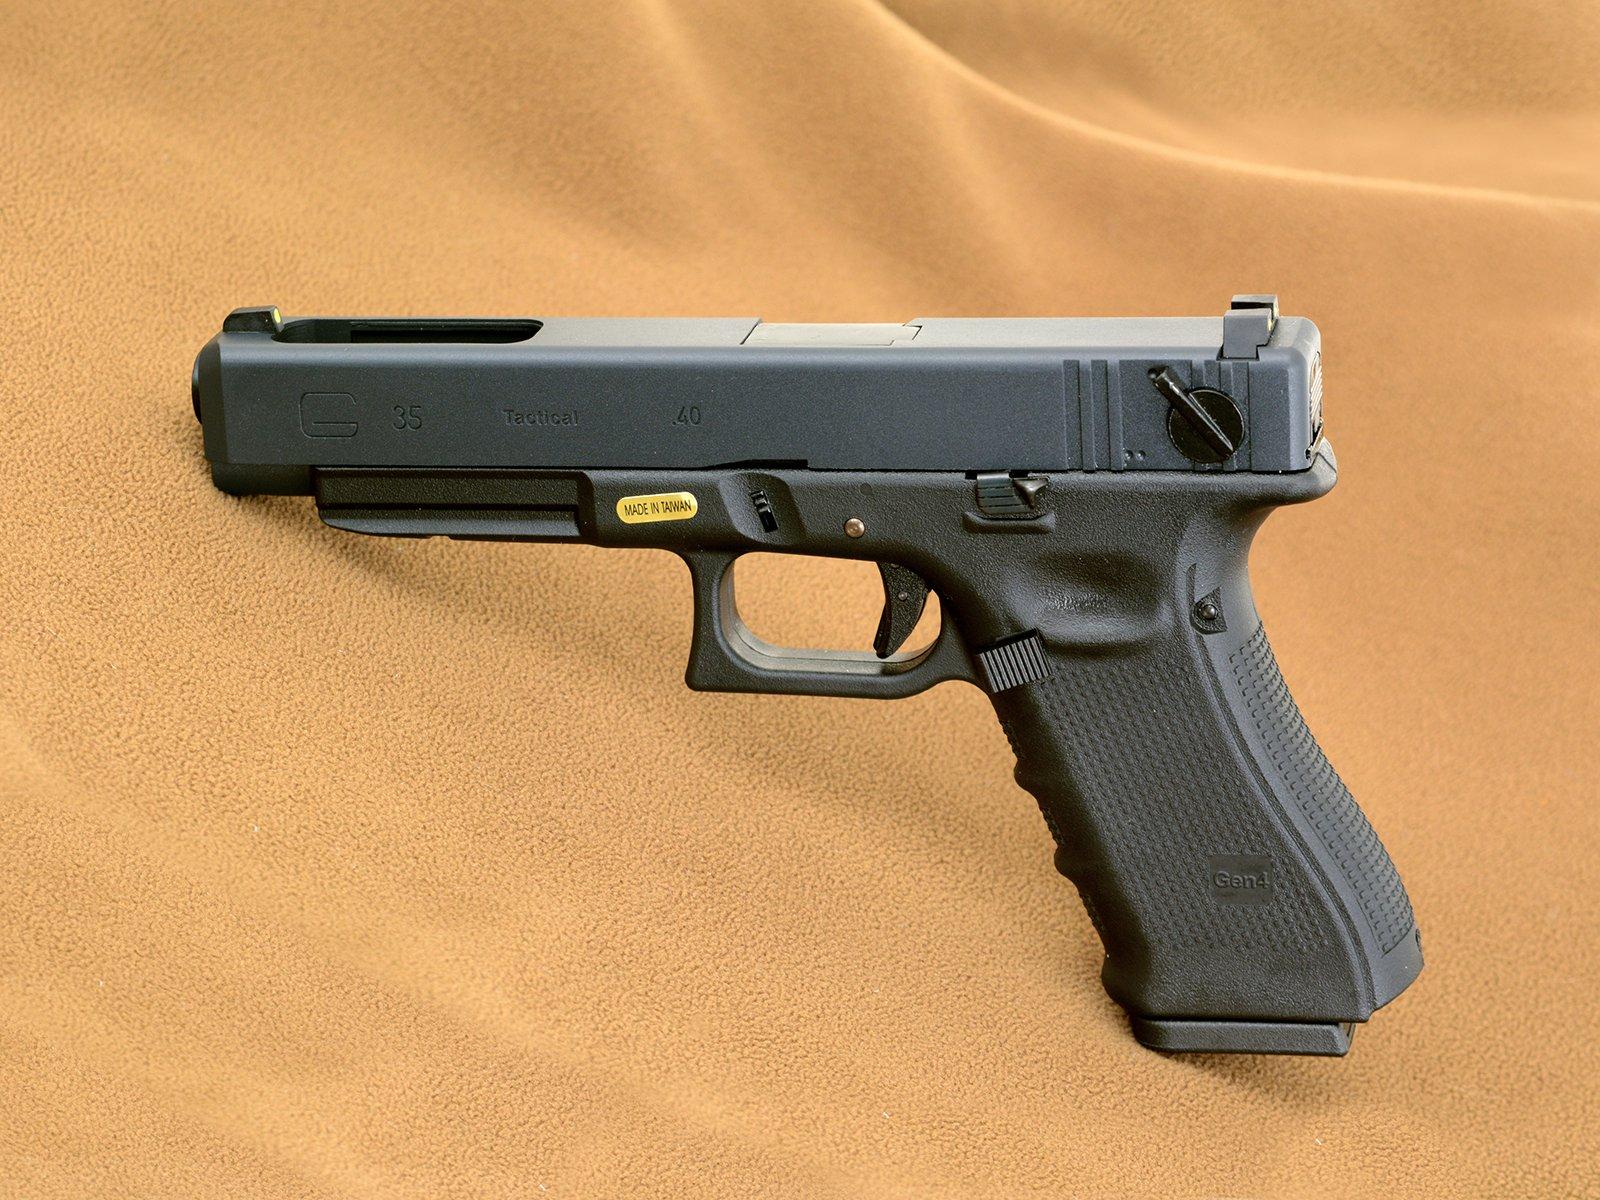 Pistolet WE G35 gen.4 BLACK nowy, OSTATNIE SZTUKI